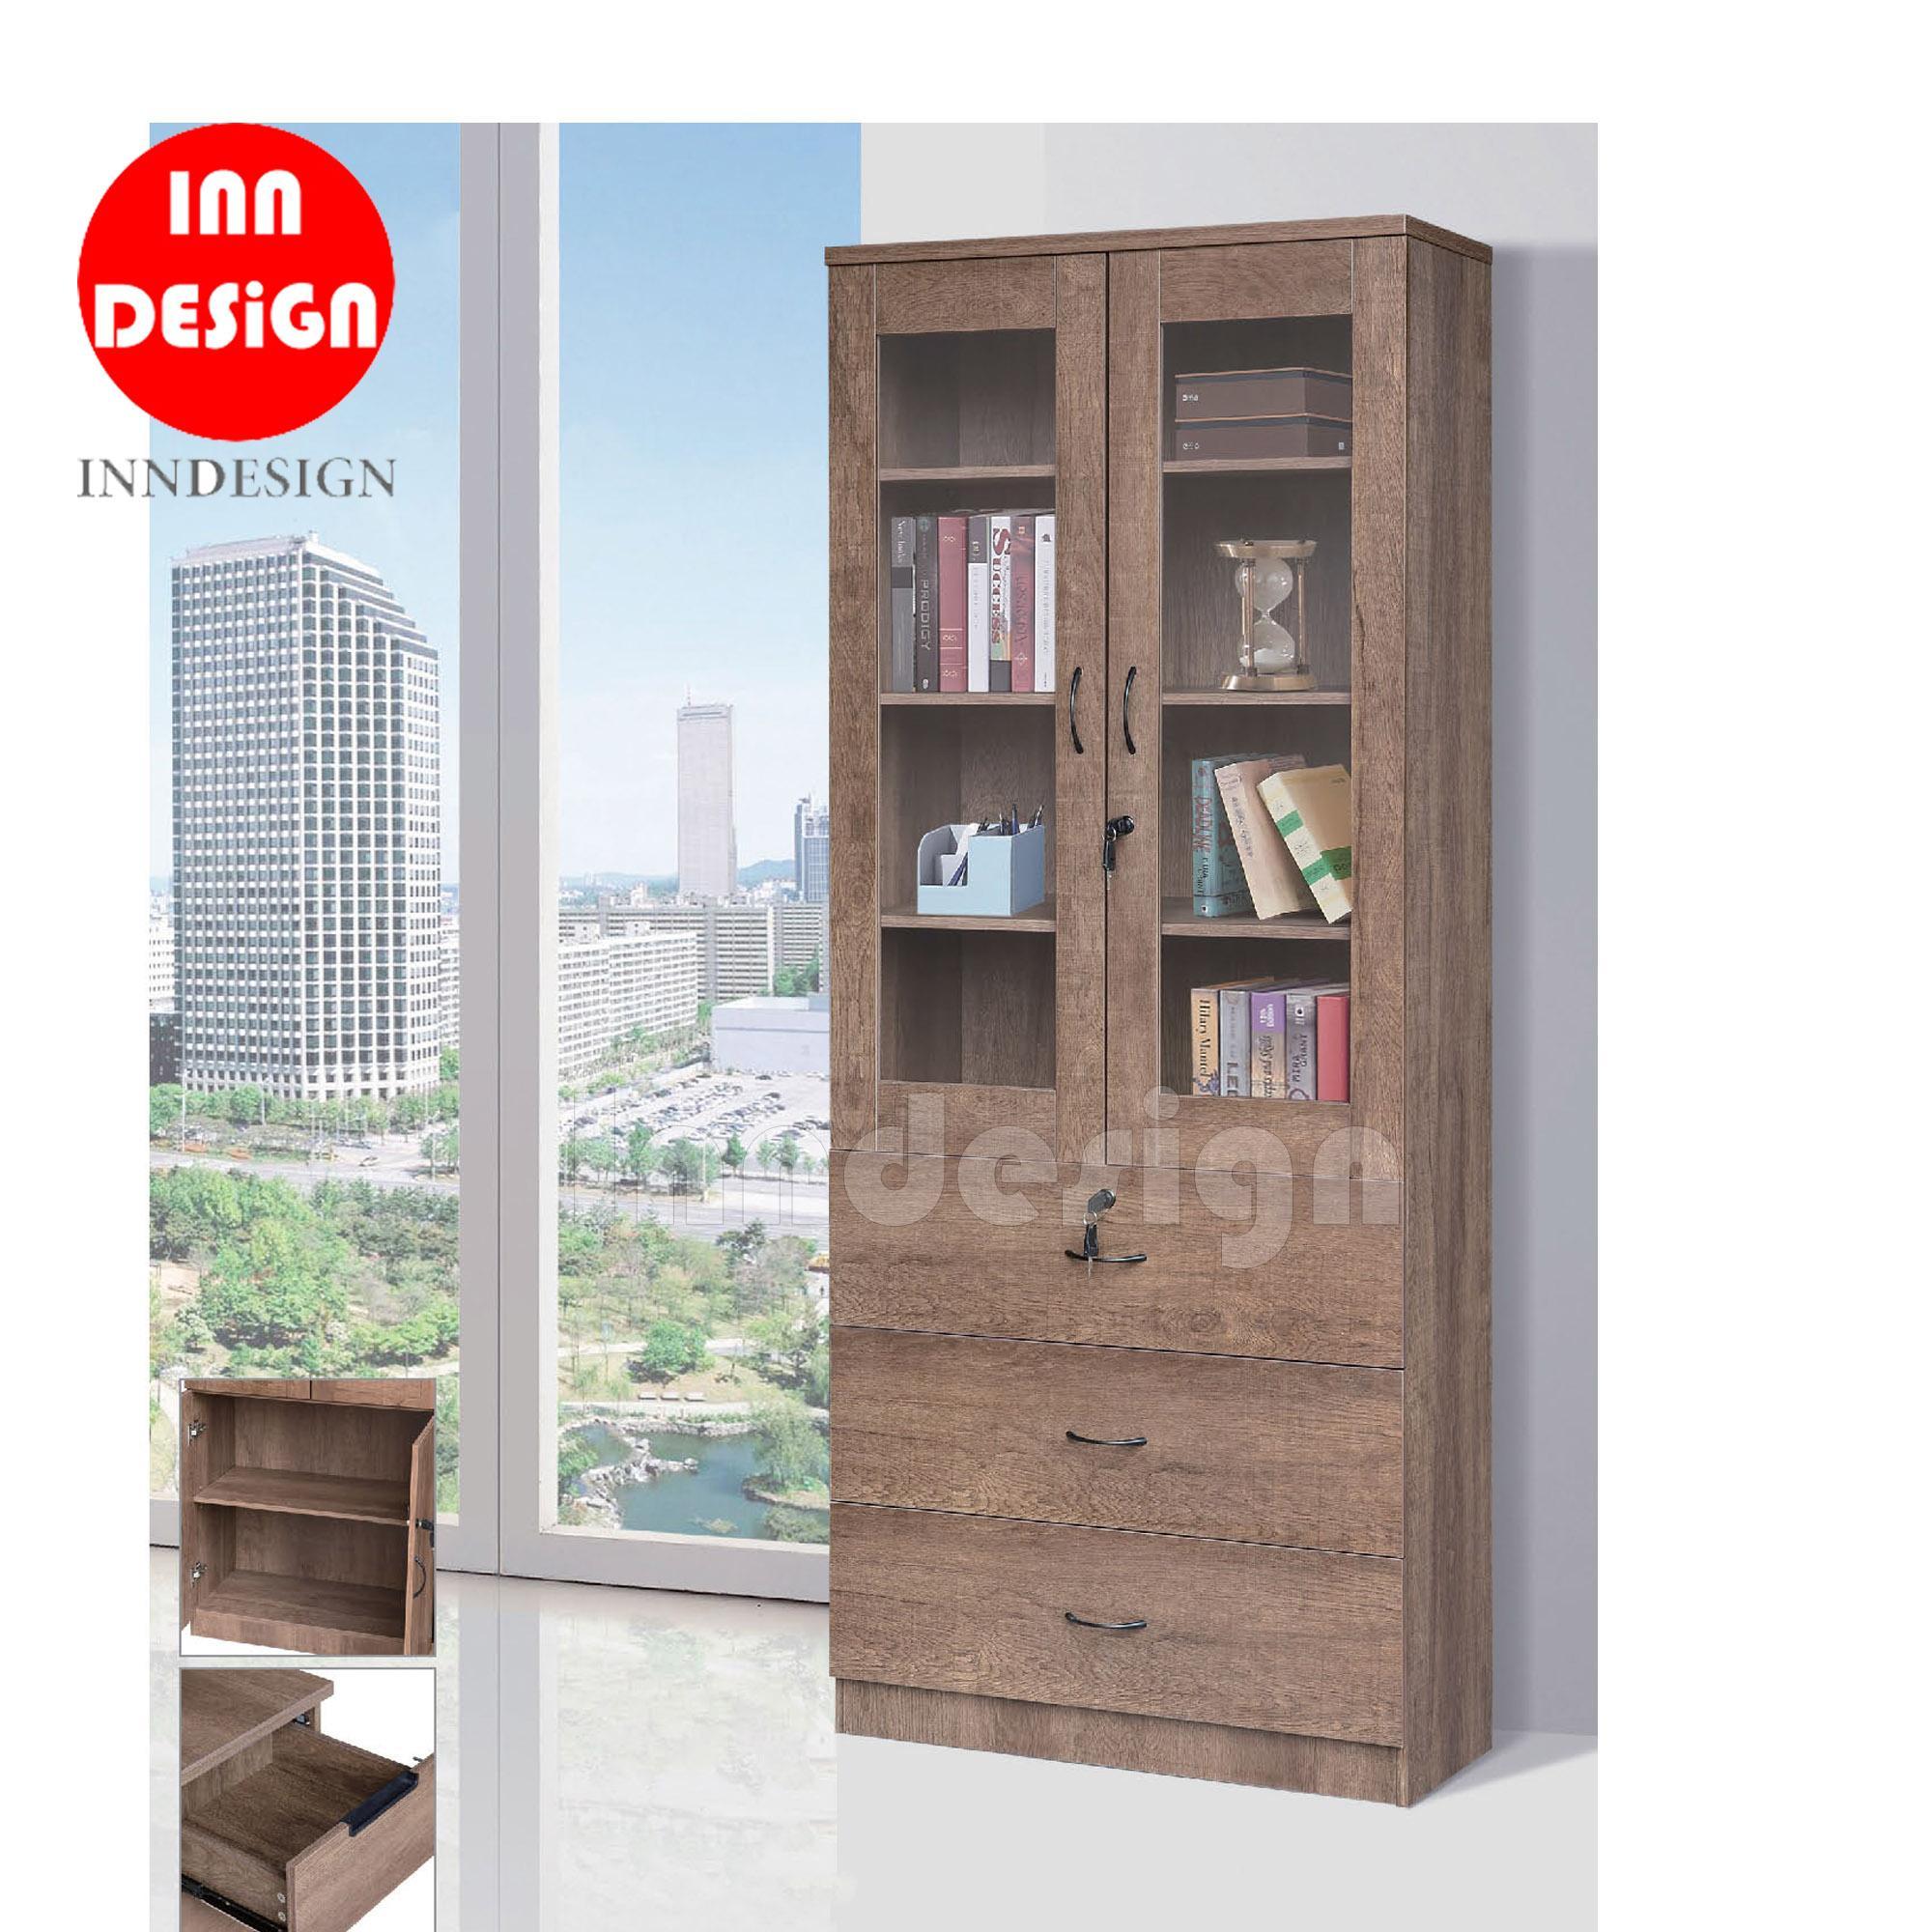 Javan II Display Bookshelf with Drawers